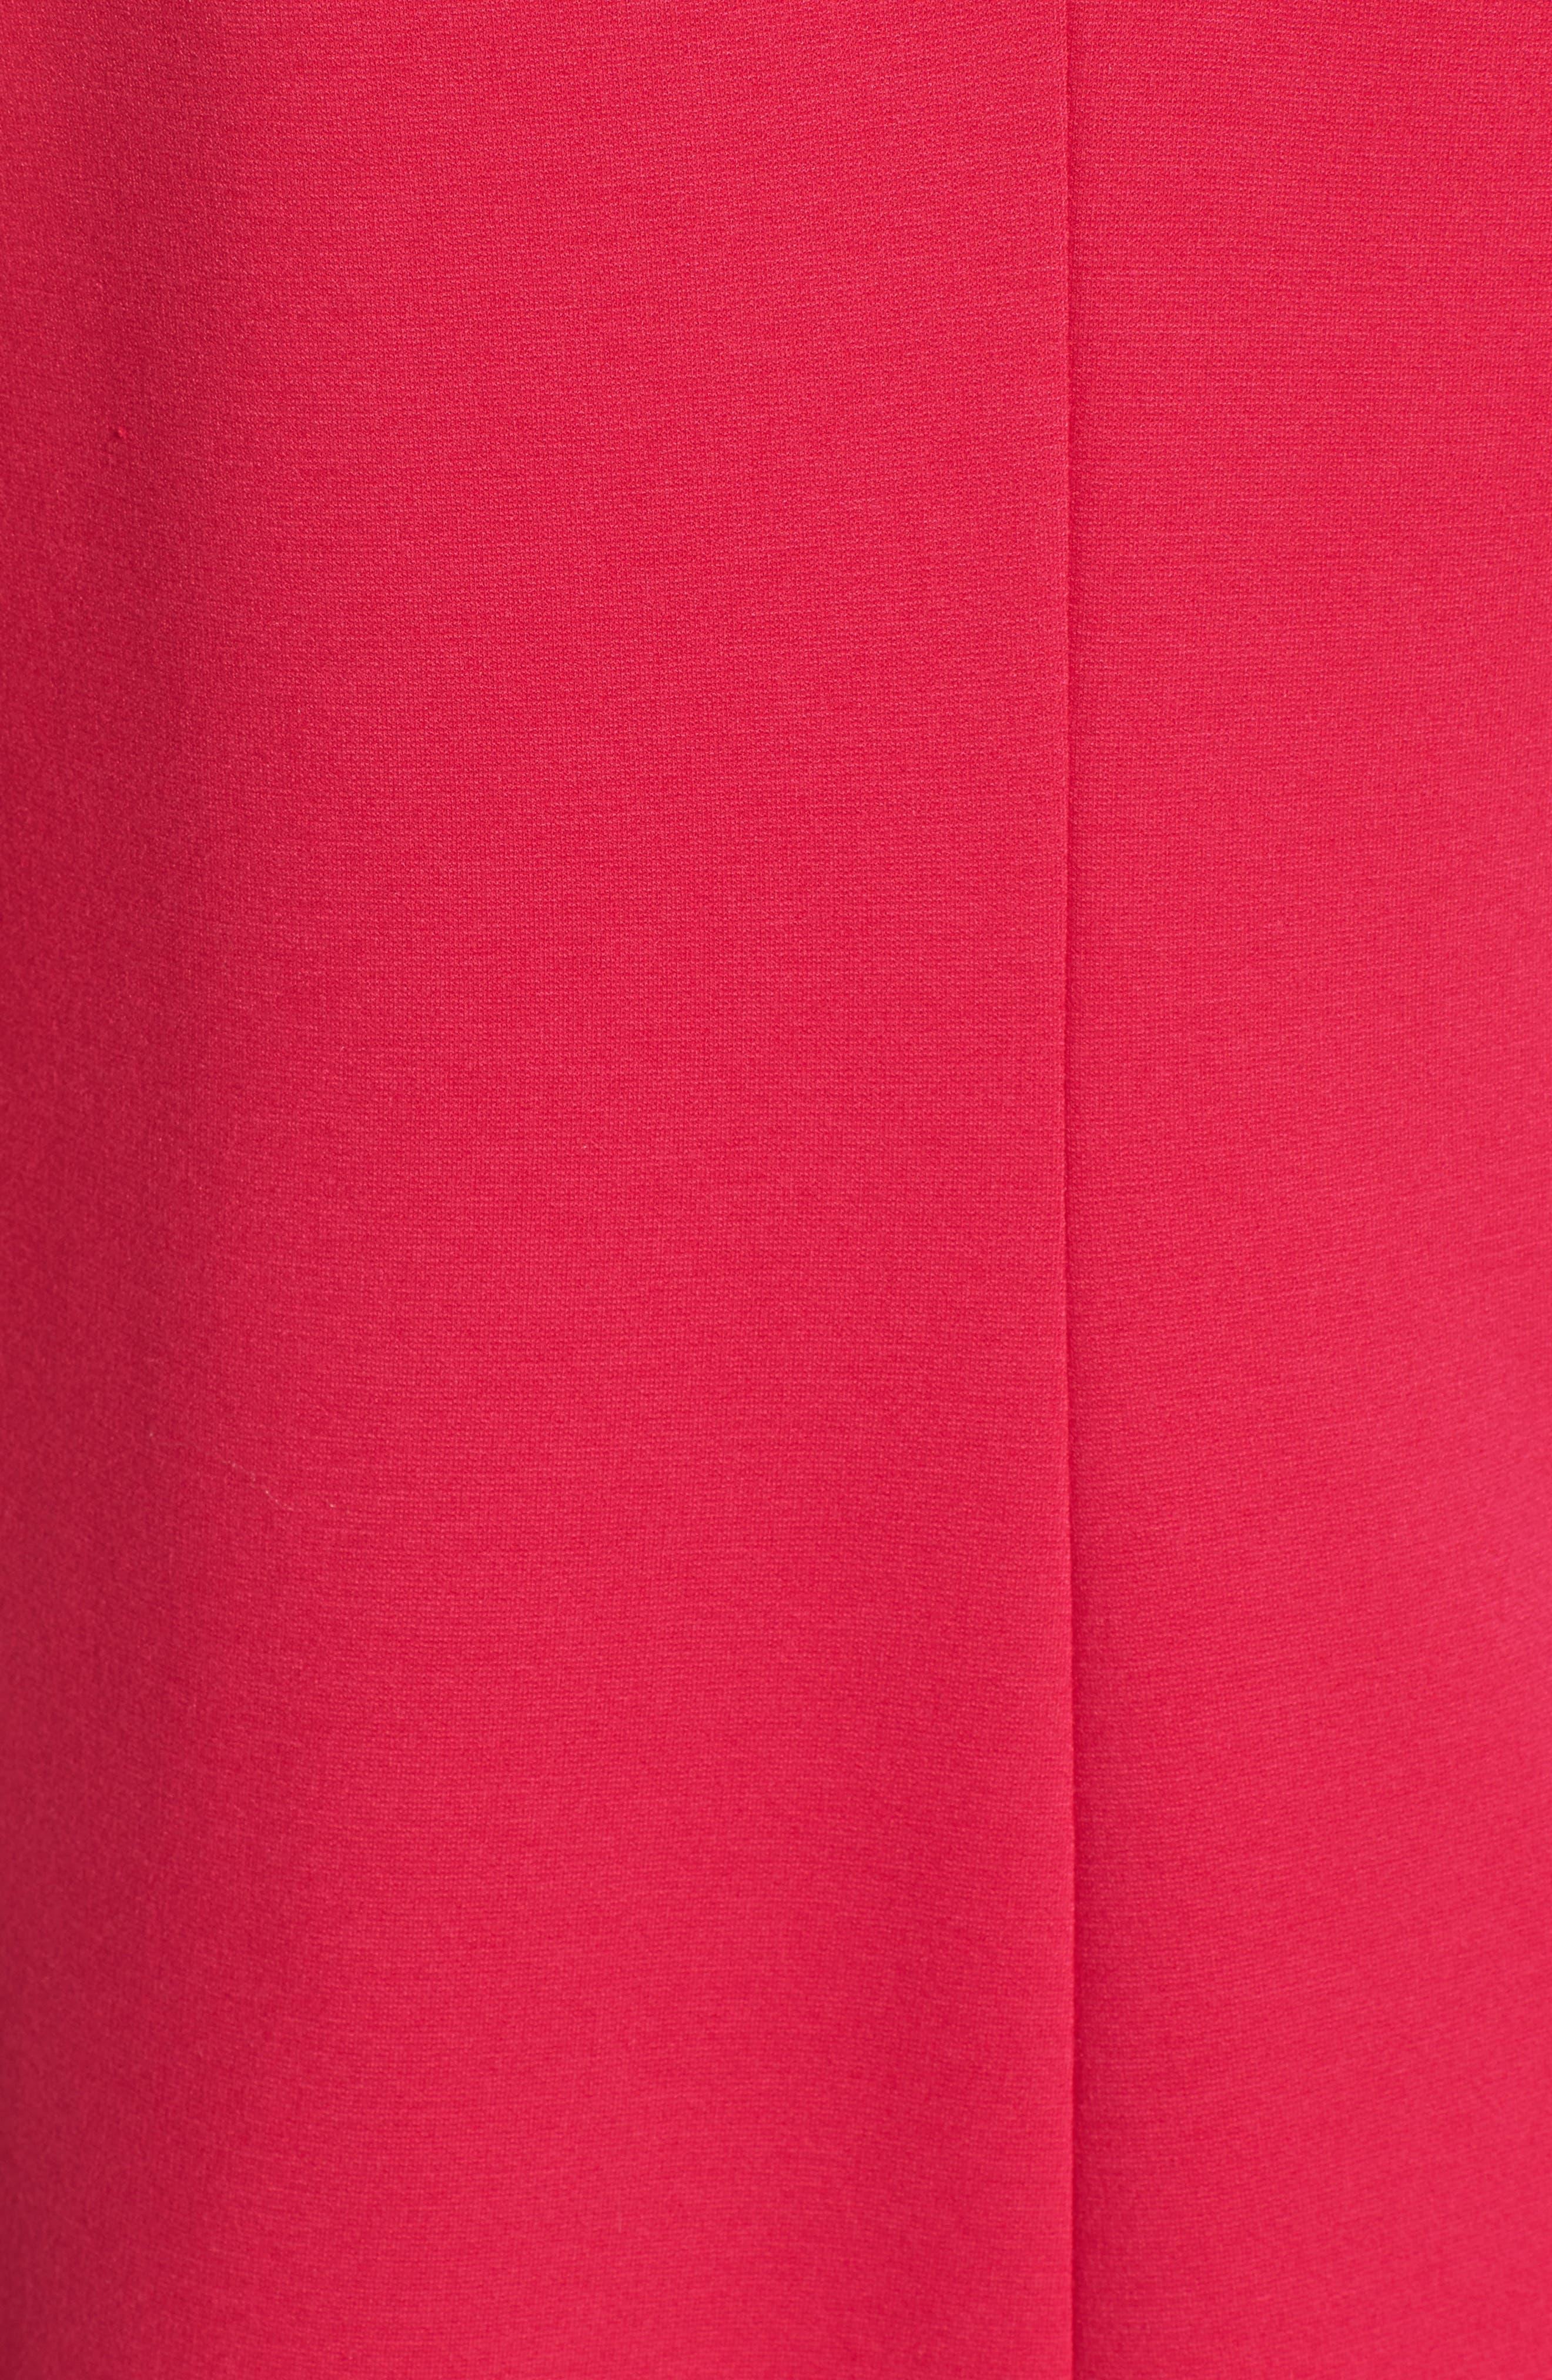 Button Back Ponte Dress,                             Alternate thumbnail 5, color,                             Fuschia